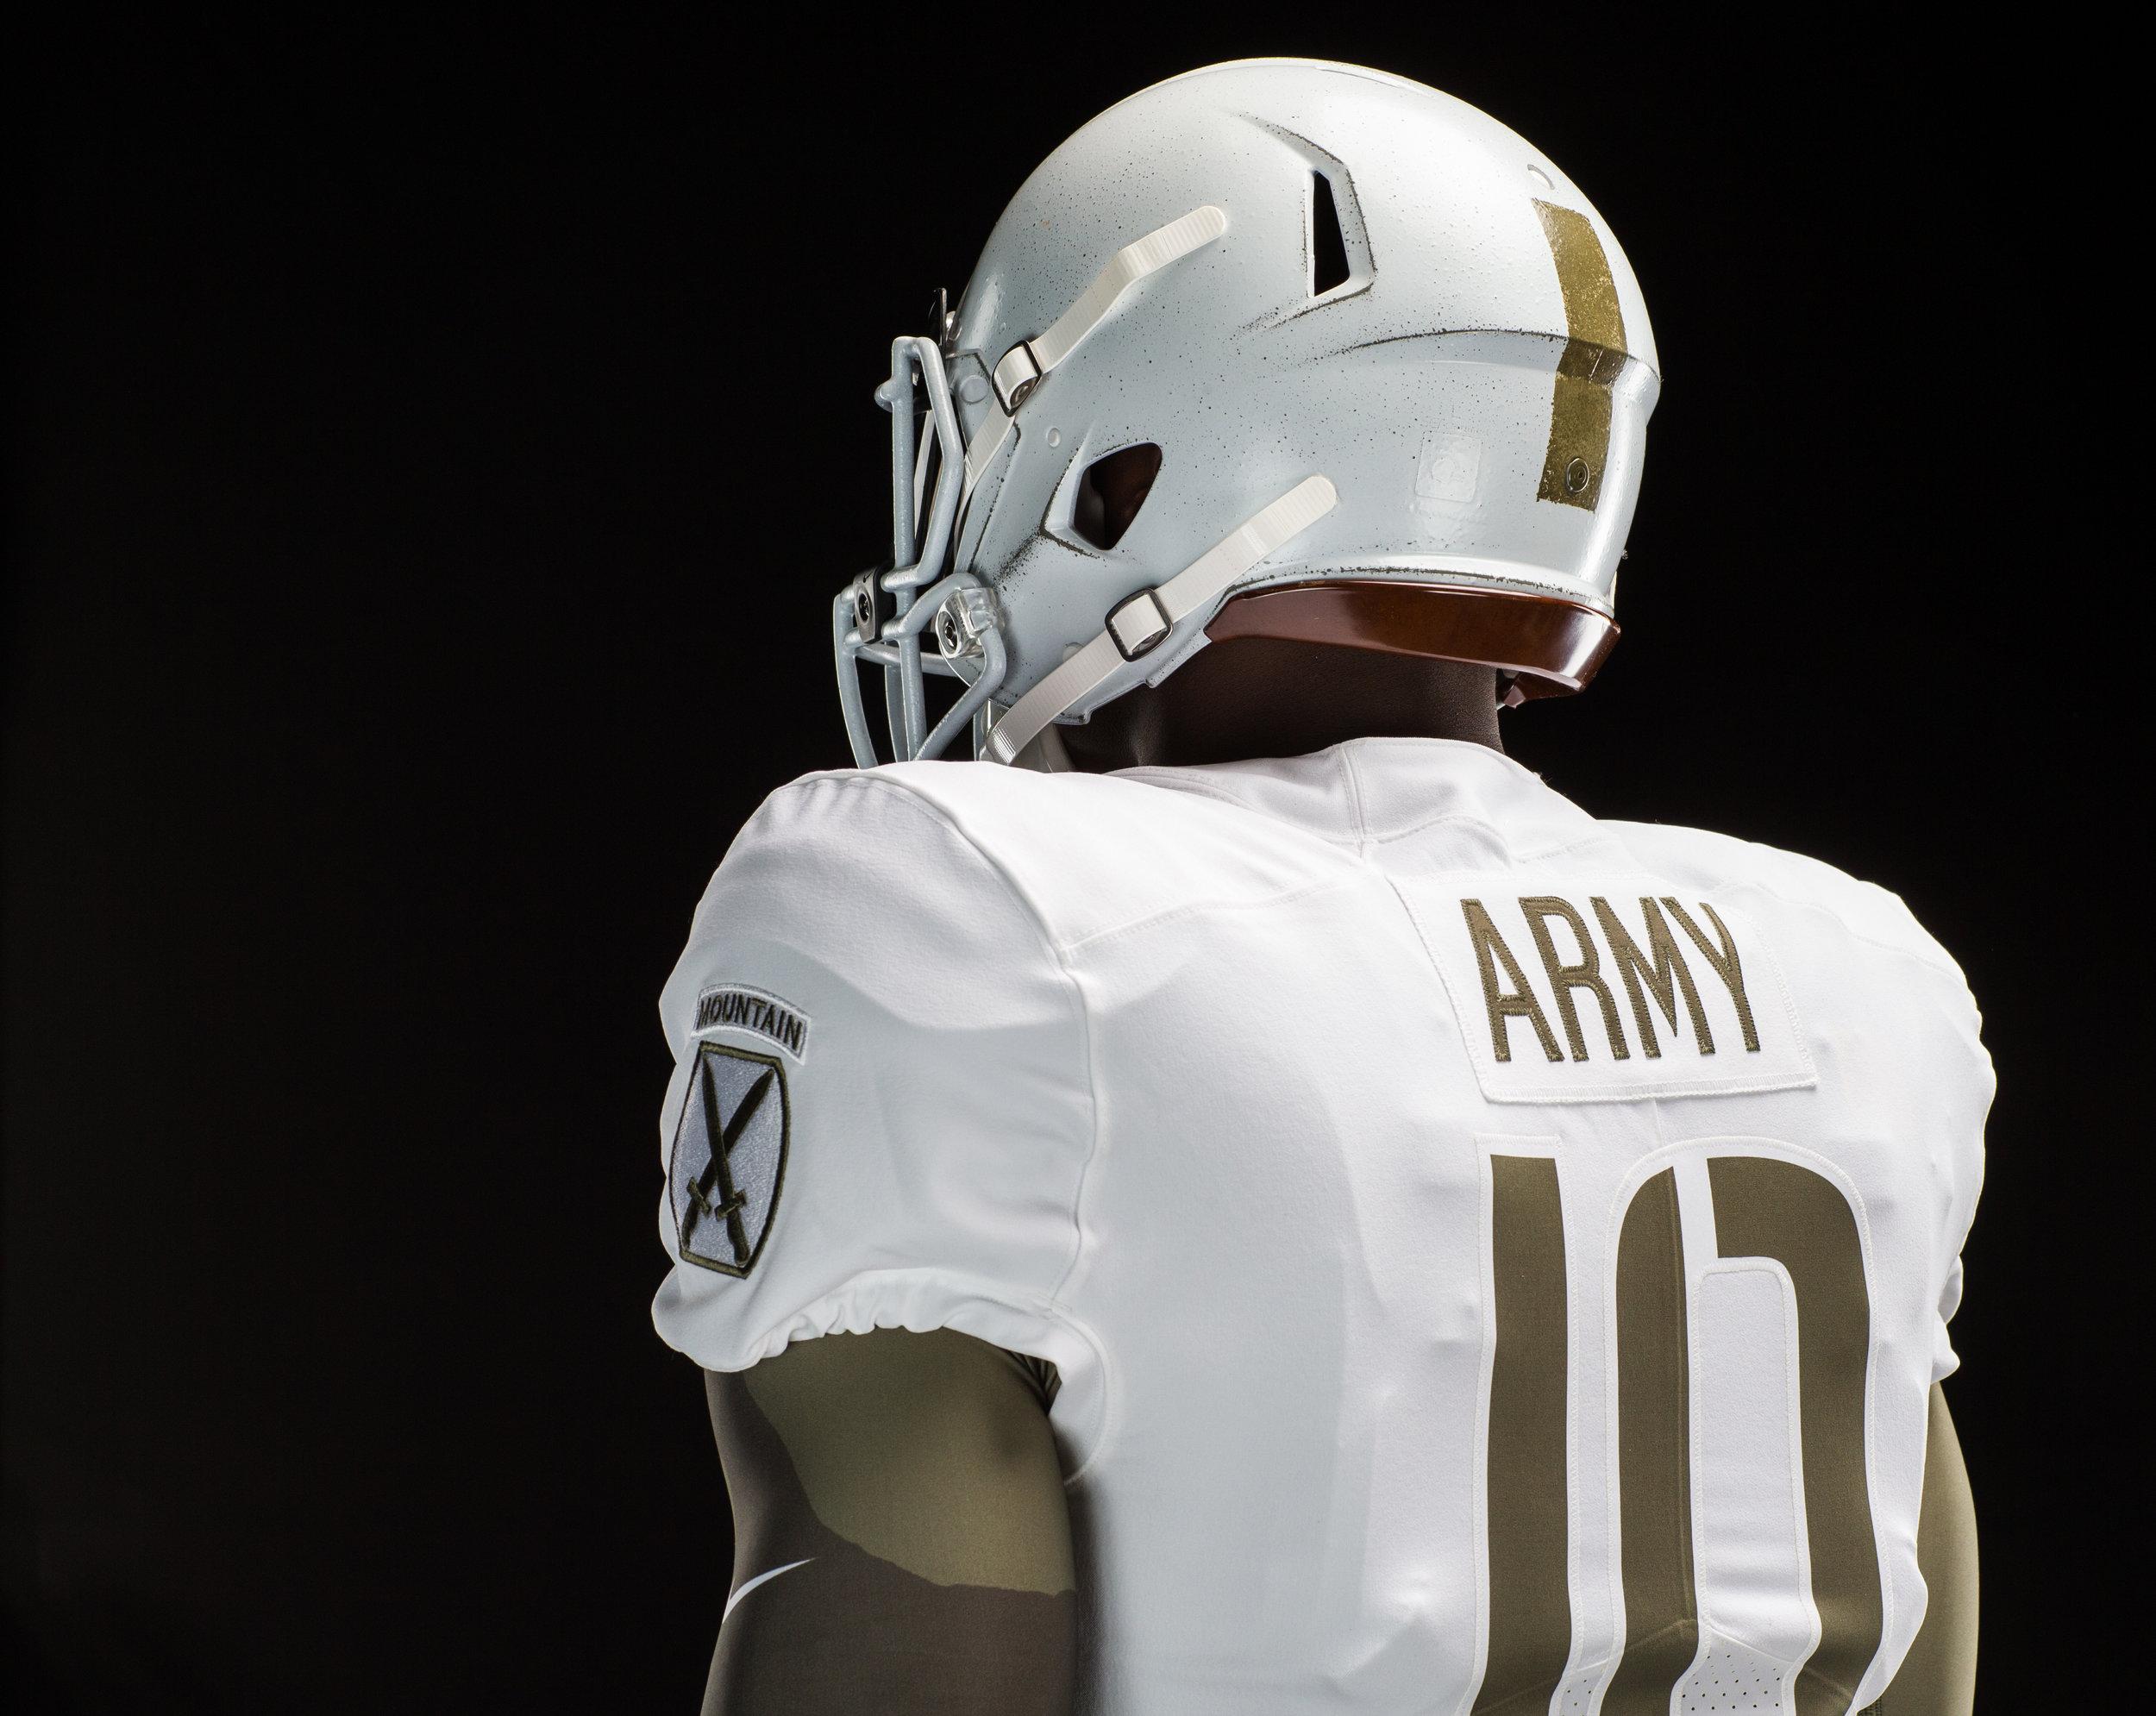 11-8-17-Army-Navy-Uniform-0051.jpg